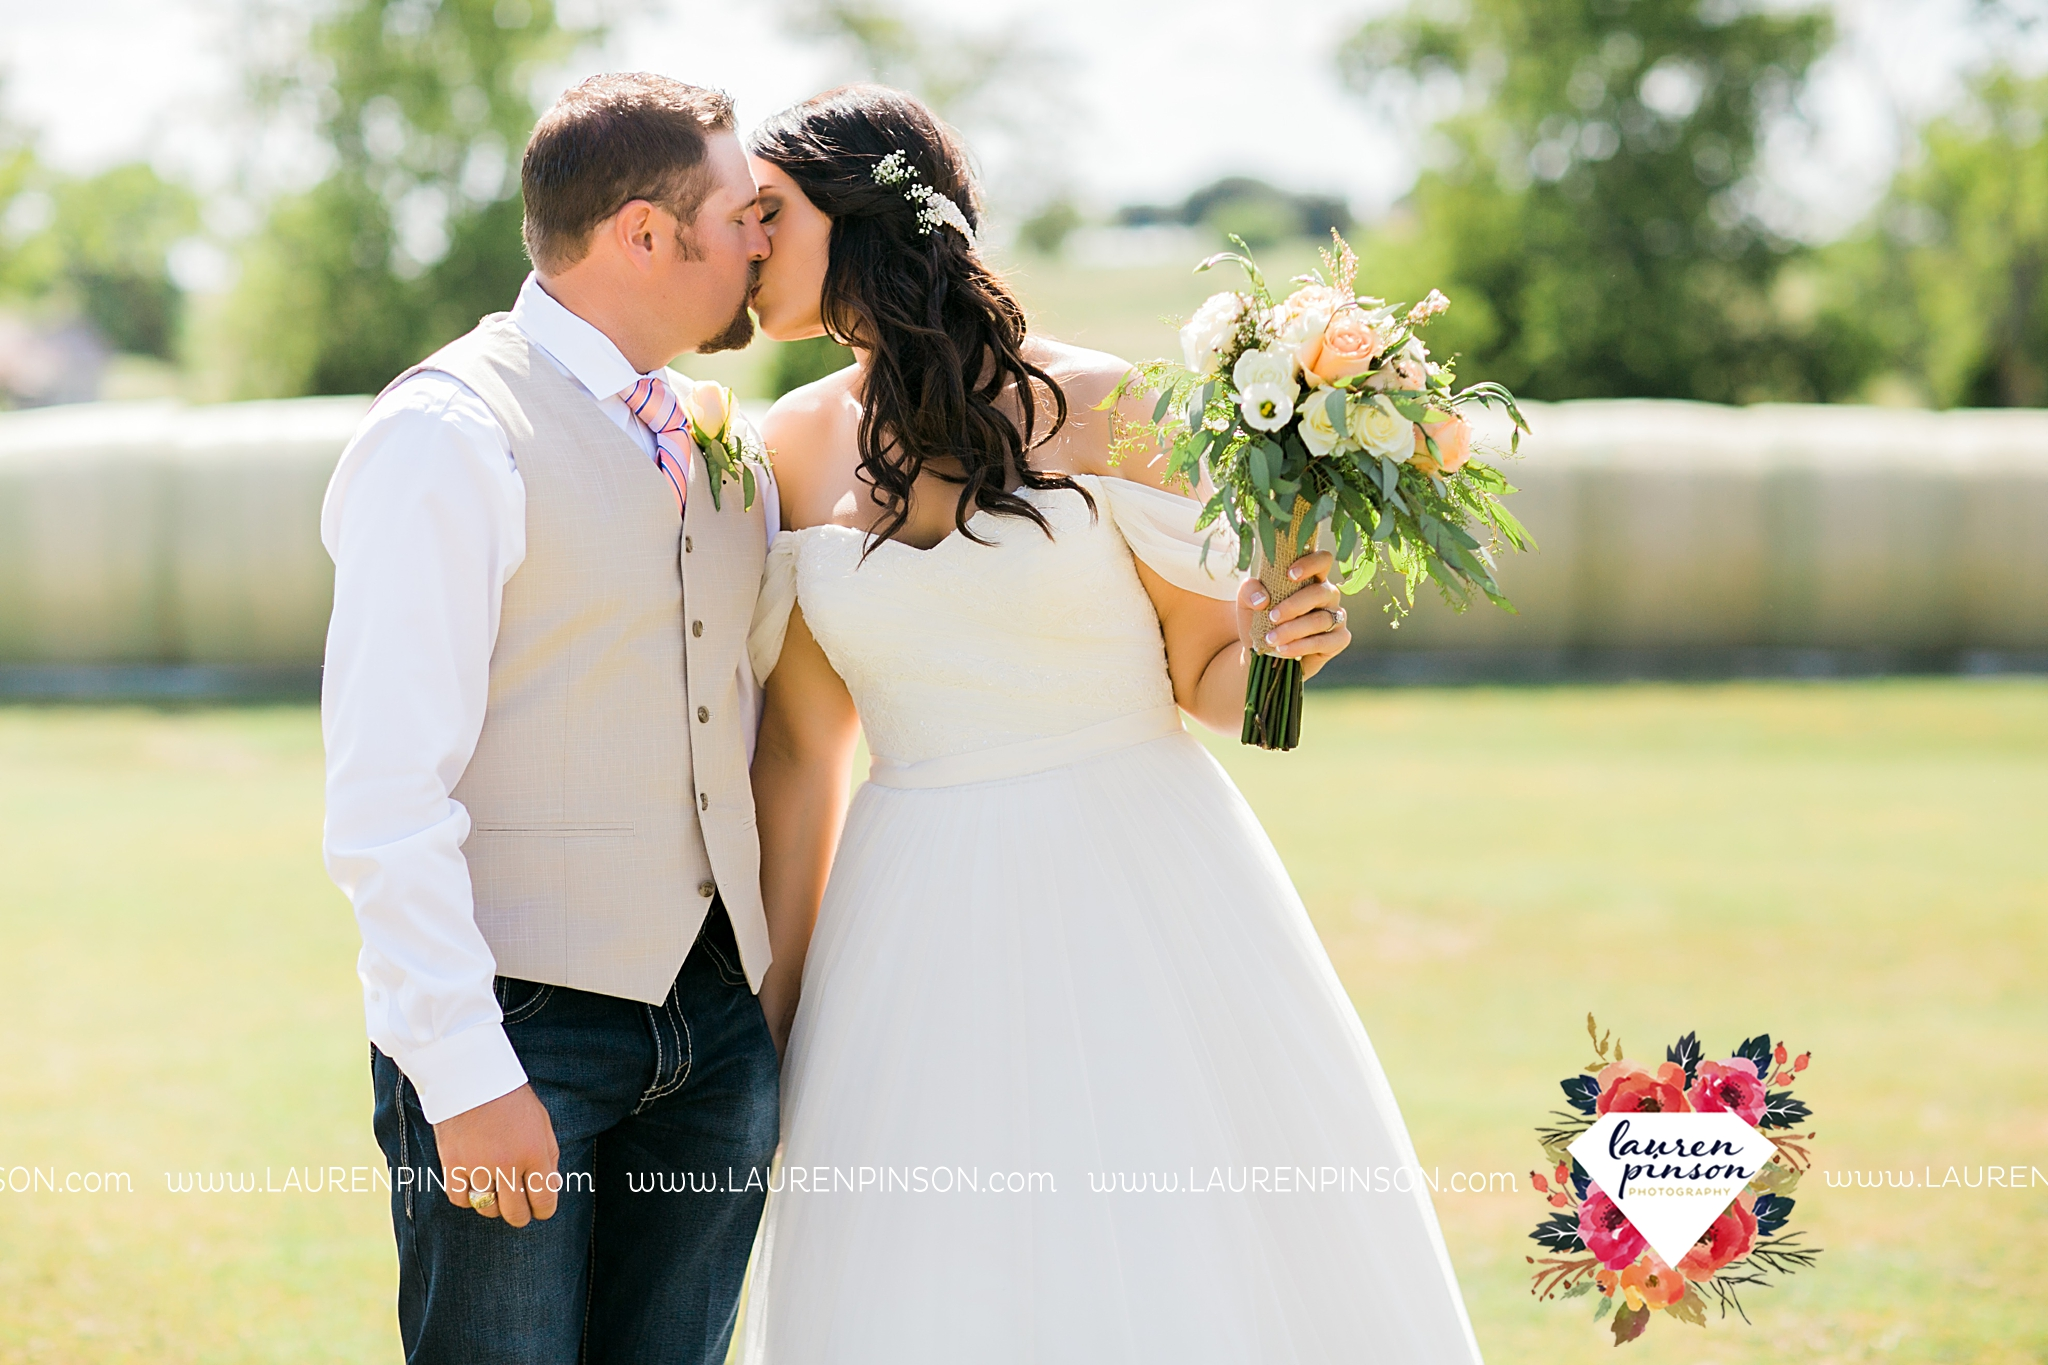 jones-barn-willow-creek-ranch-wedding-in-cleburne-texas-fort-worth-dfw-wichita-falls-wedding-photography_3226.jpg